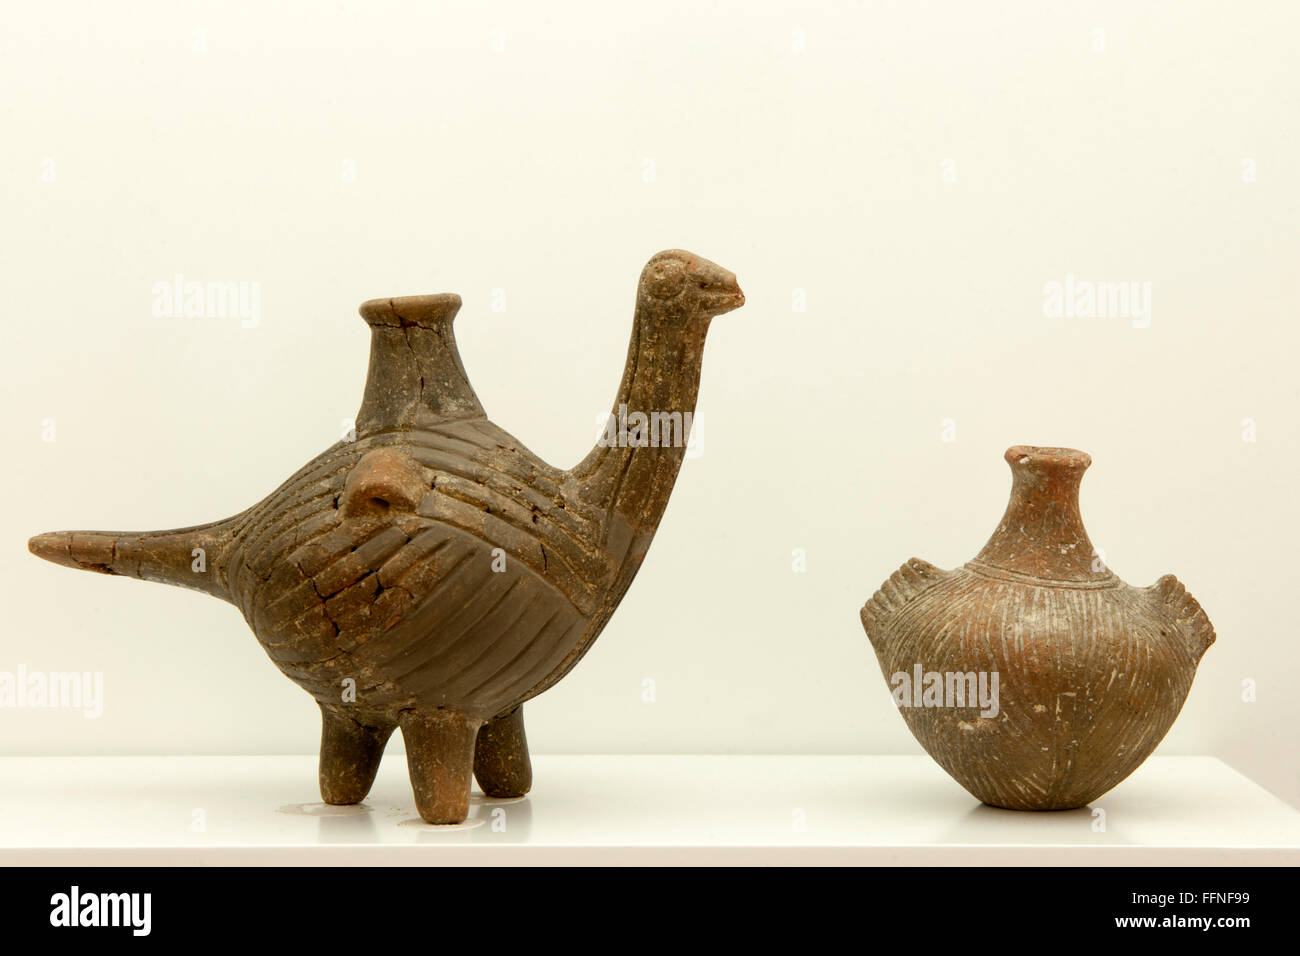 Griechenland, Kreta, Agios Nikolaos, Archäologisches Museum,  Vasen - Stock Image